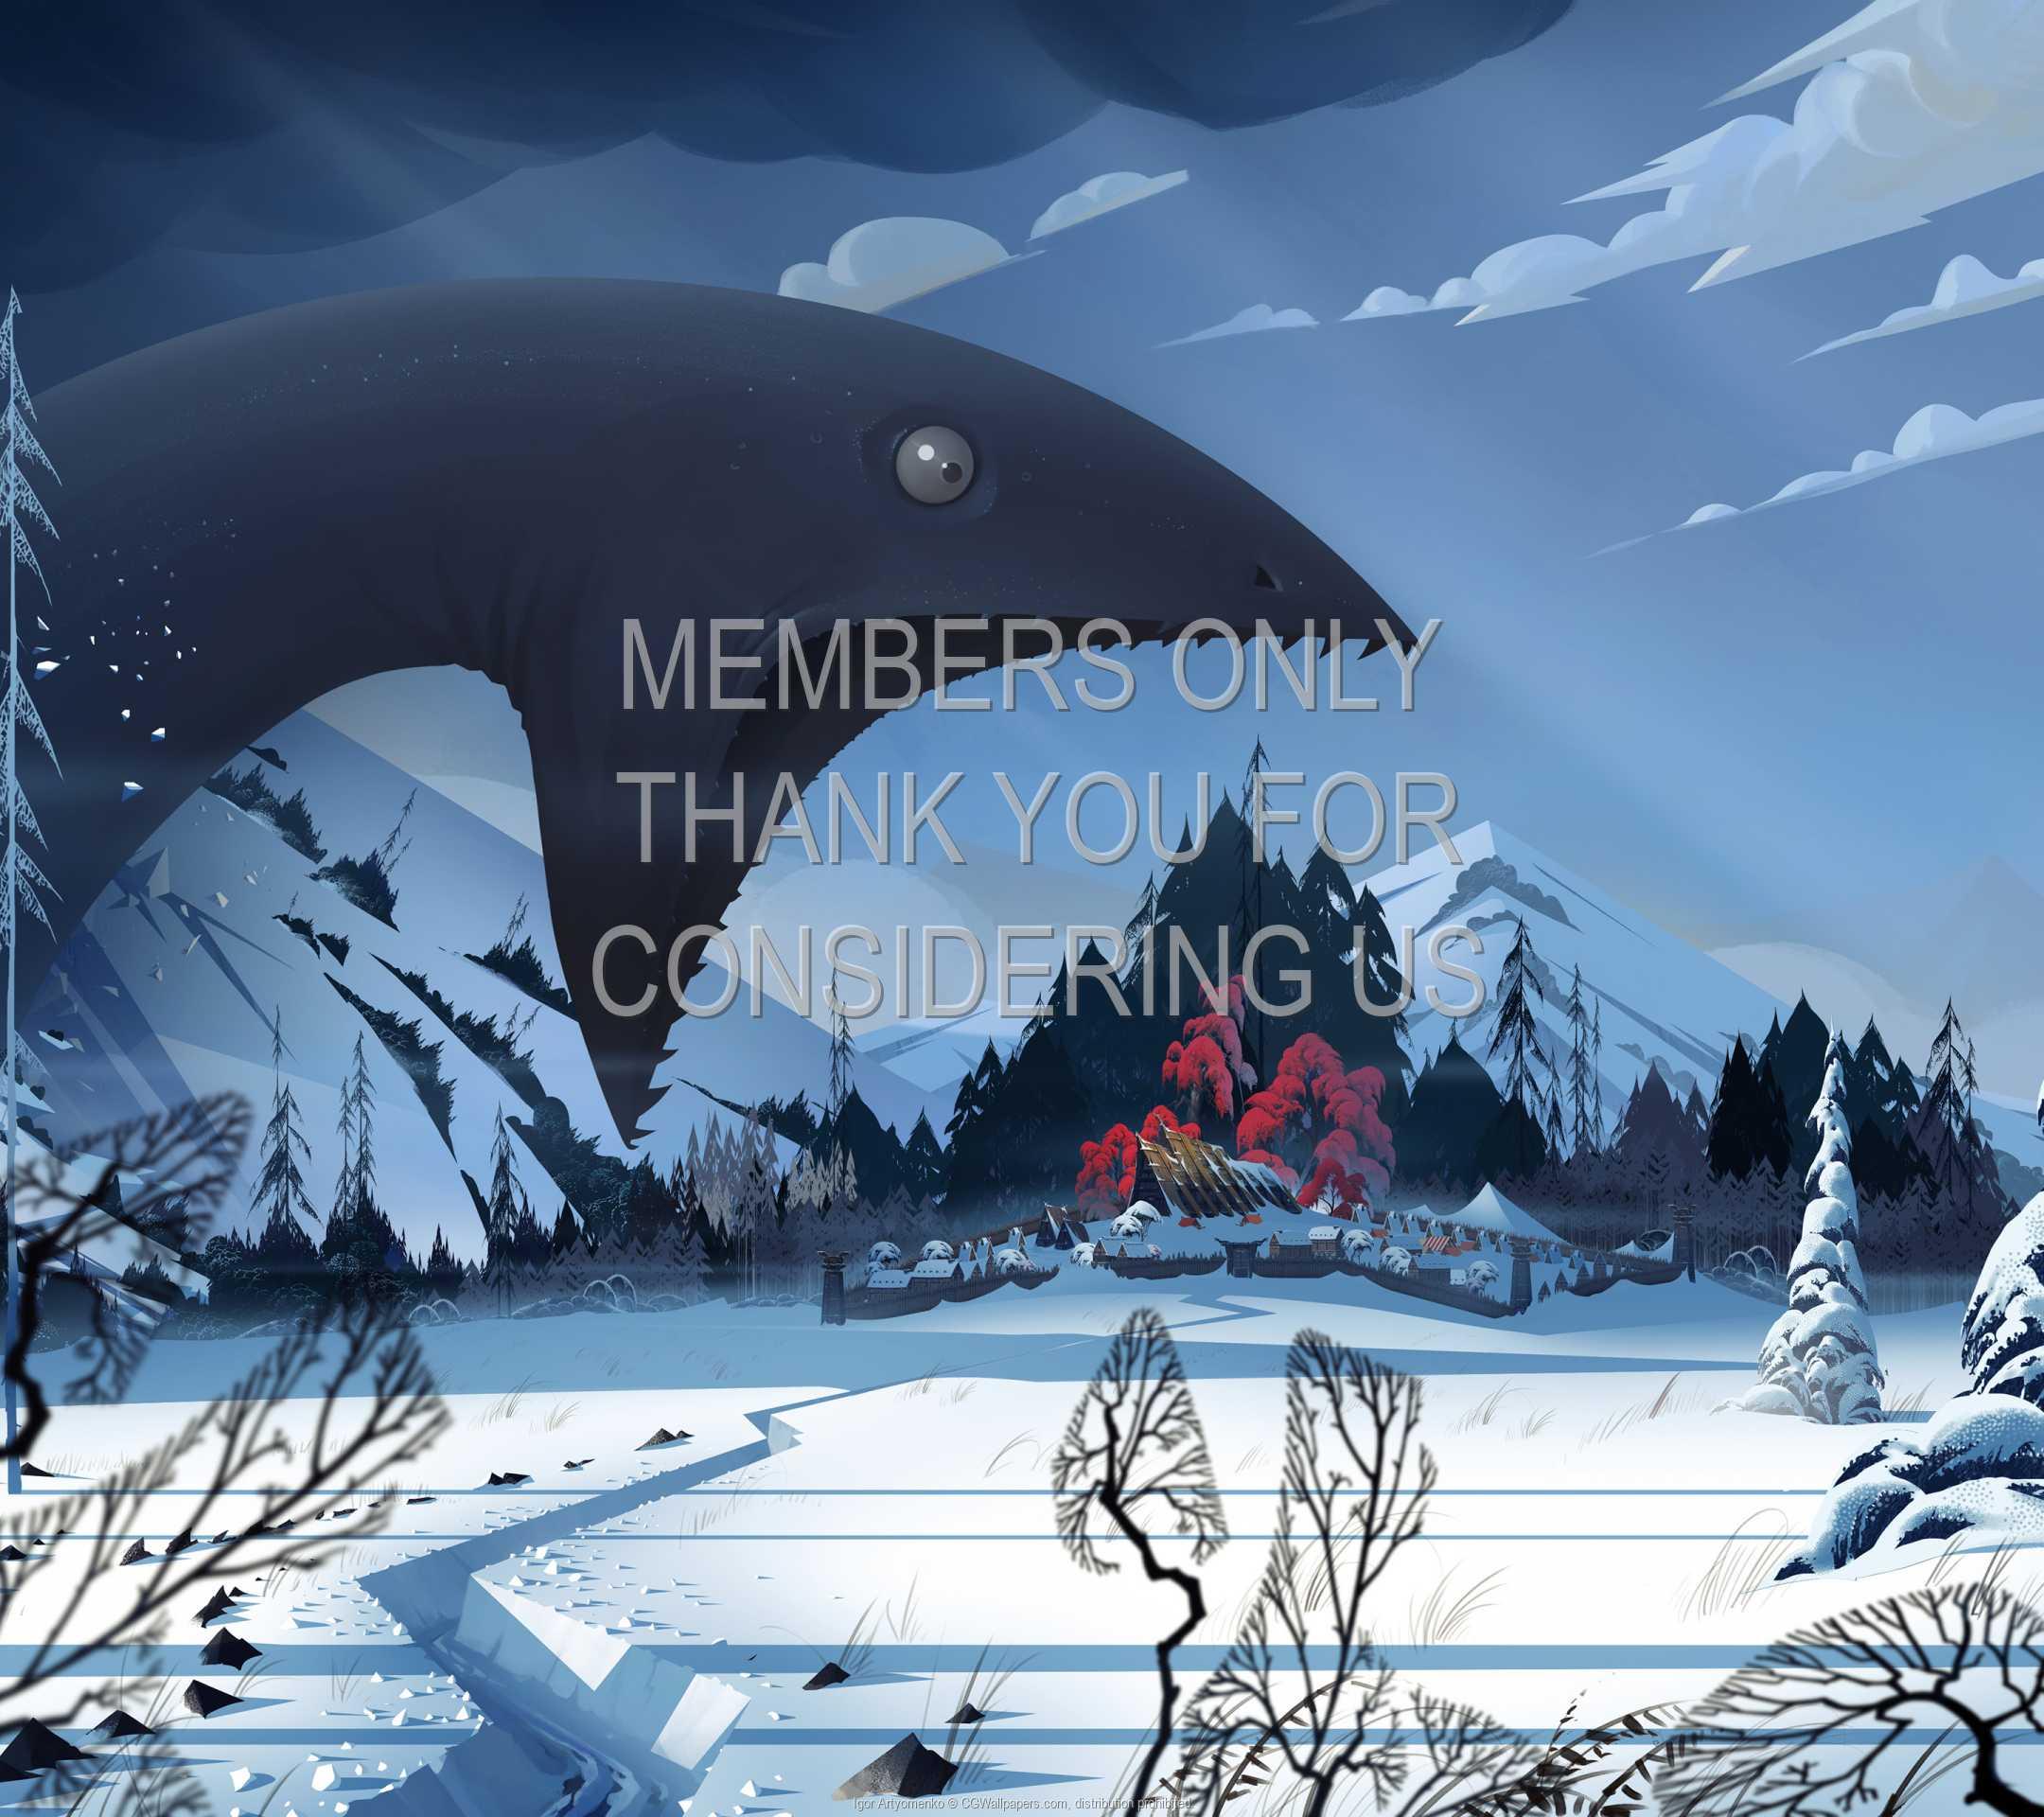 Igor Artyomenko 1080p Horizontal Mobiele achtergrond 07